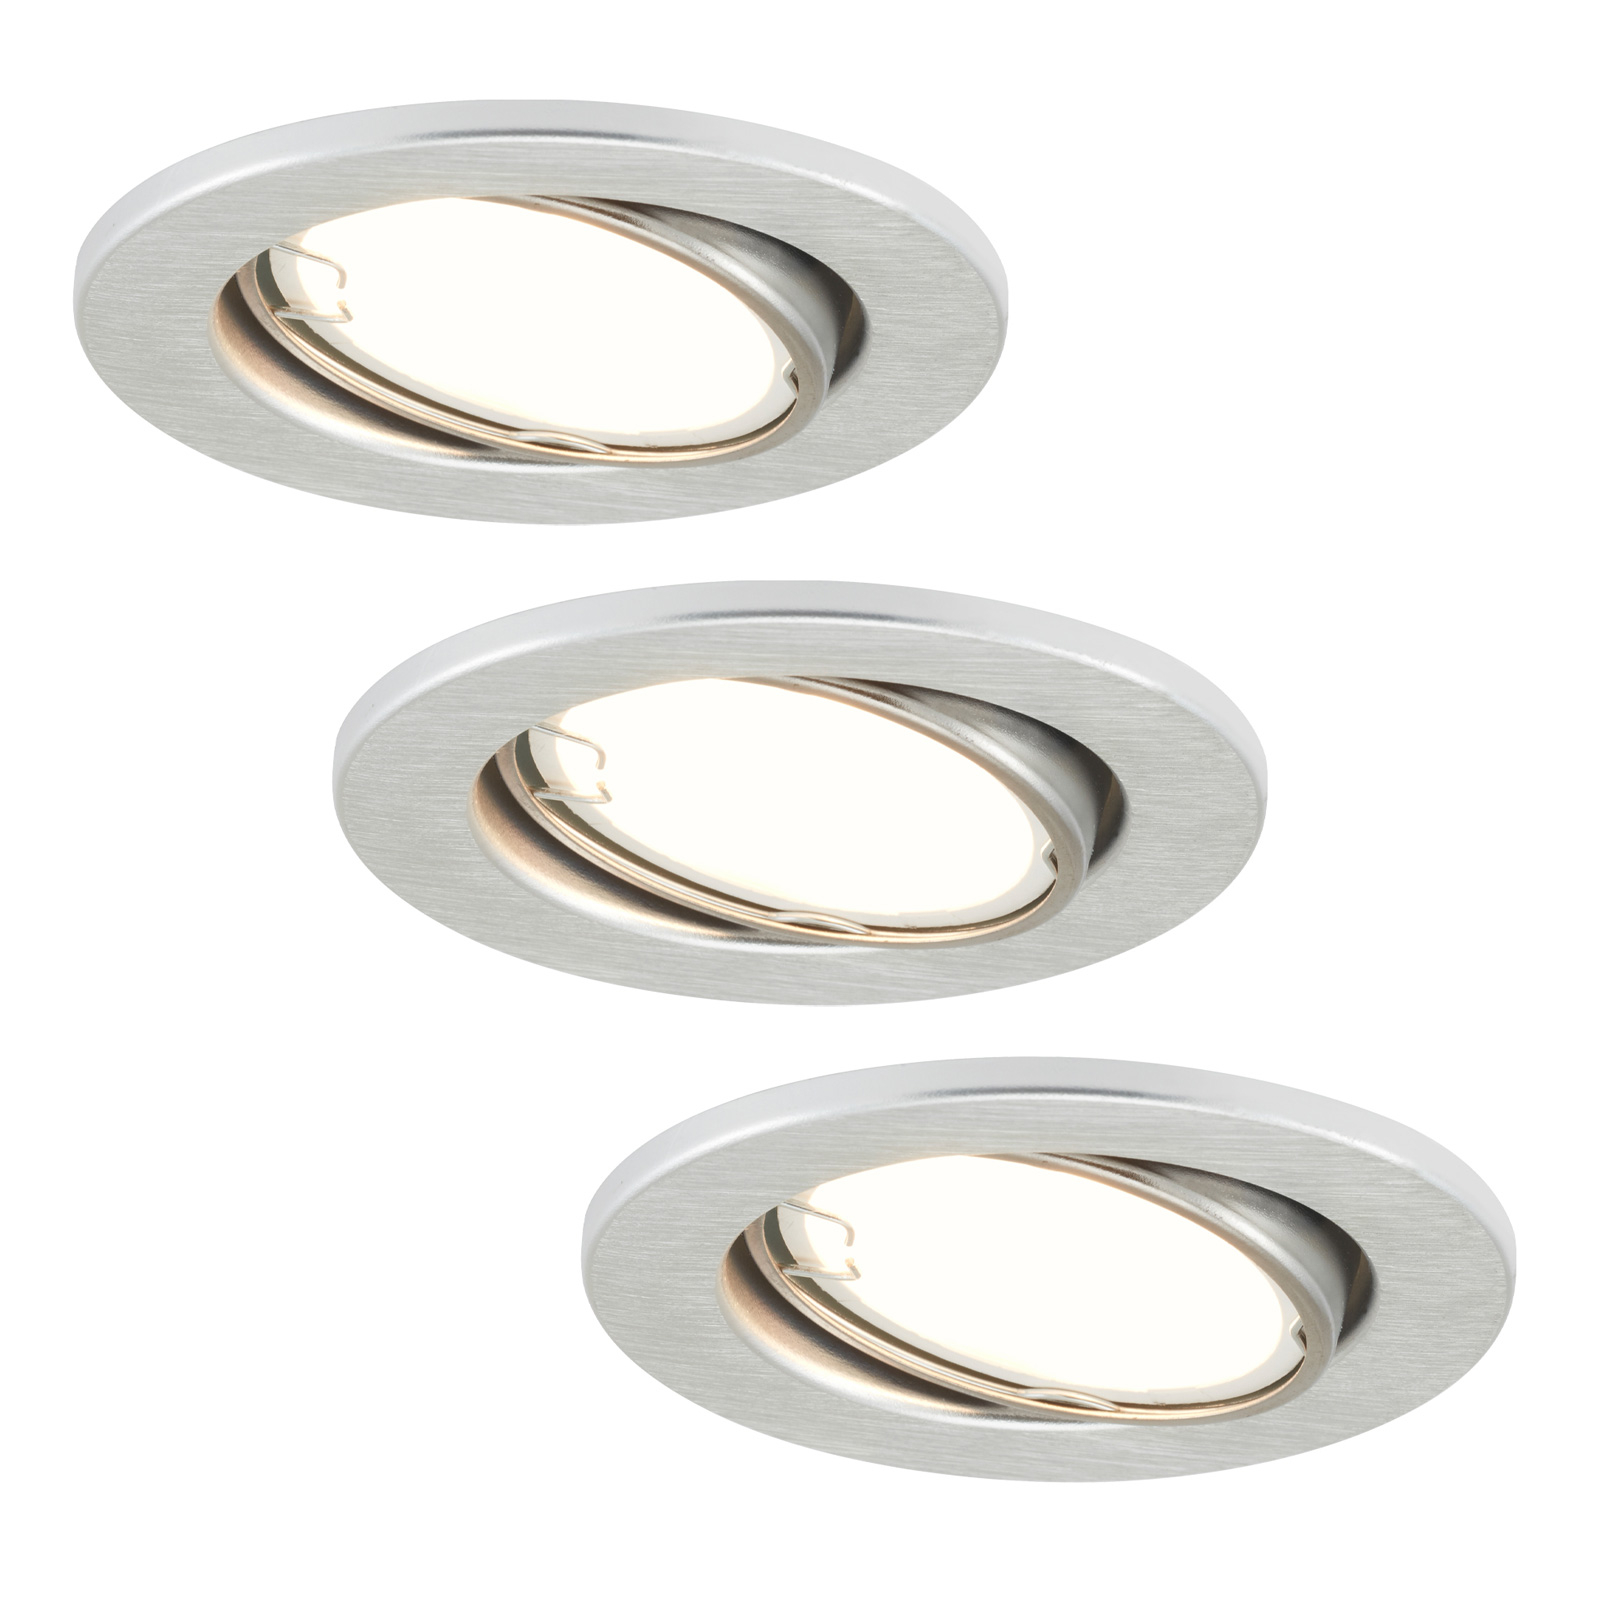 Spot LED incasso 7221-039 Fit set 3x alluminio